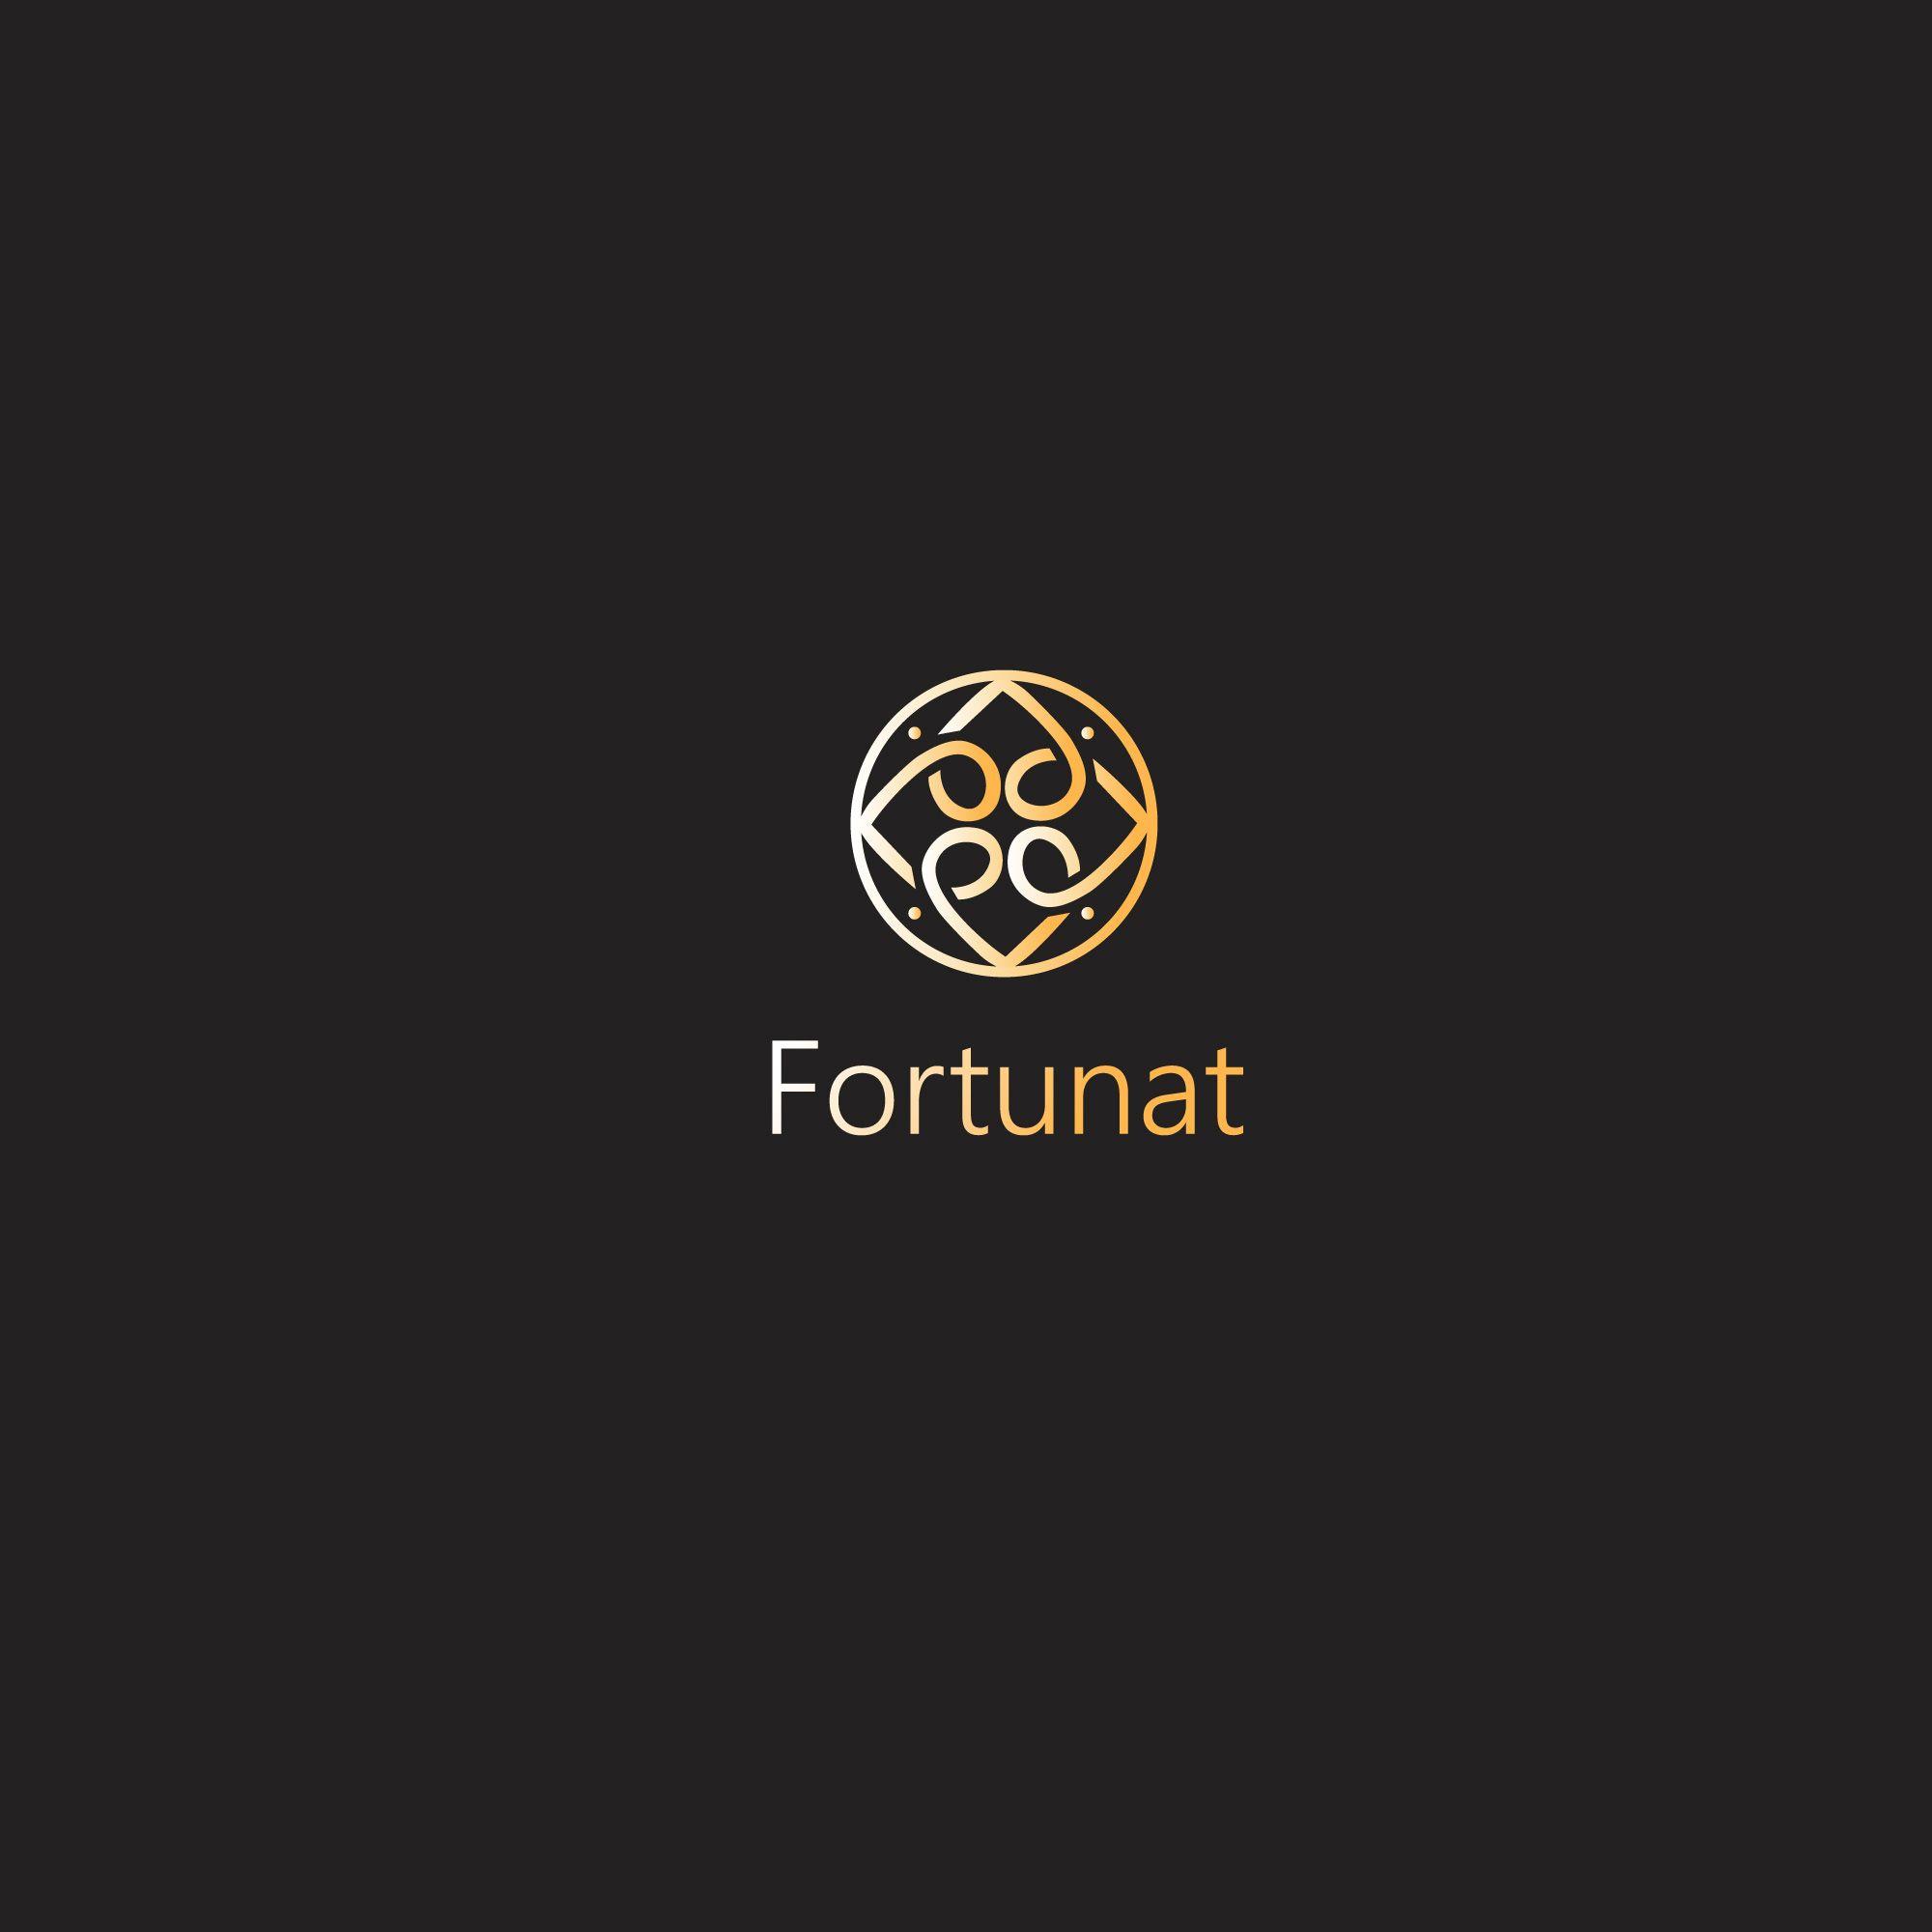 Логотип для Fortunat - дизайнер MashaHai